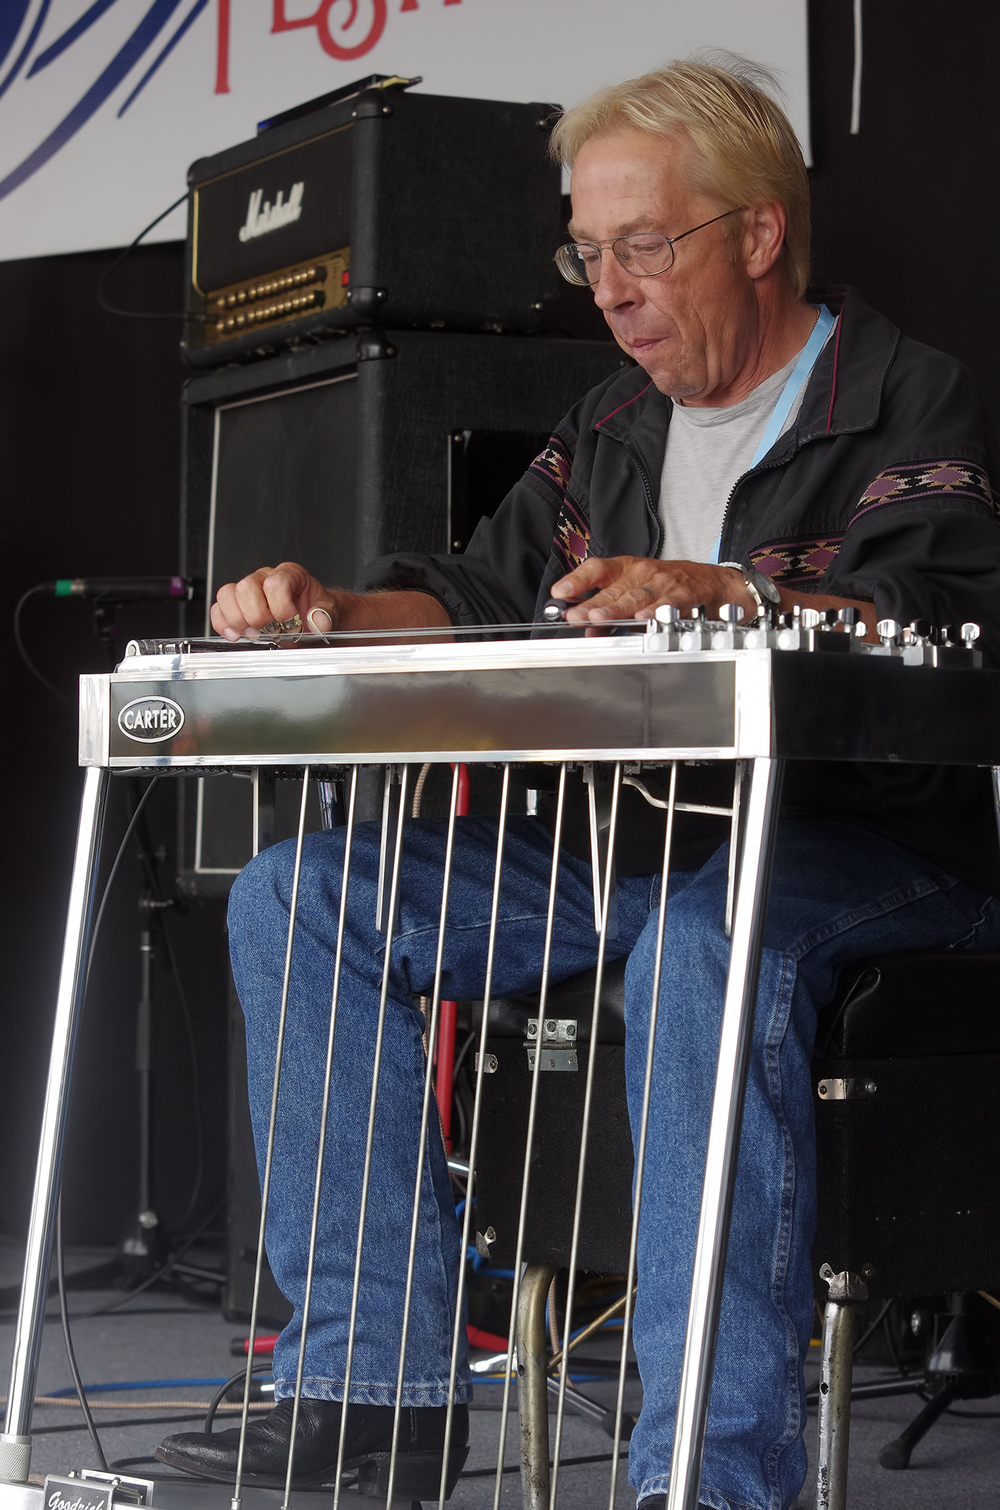 Sonny Bandura